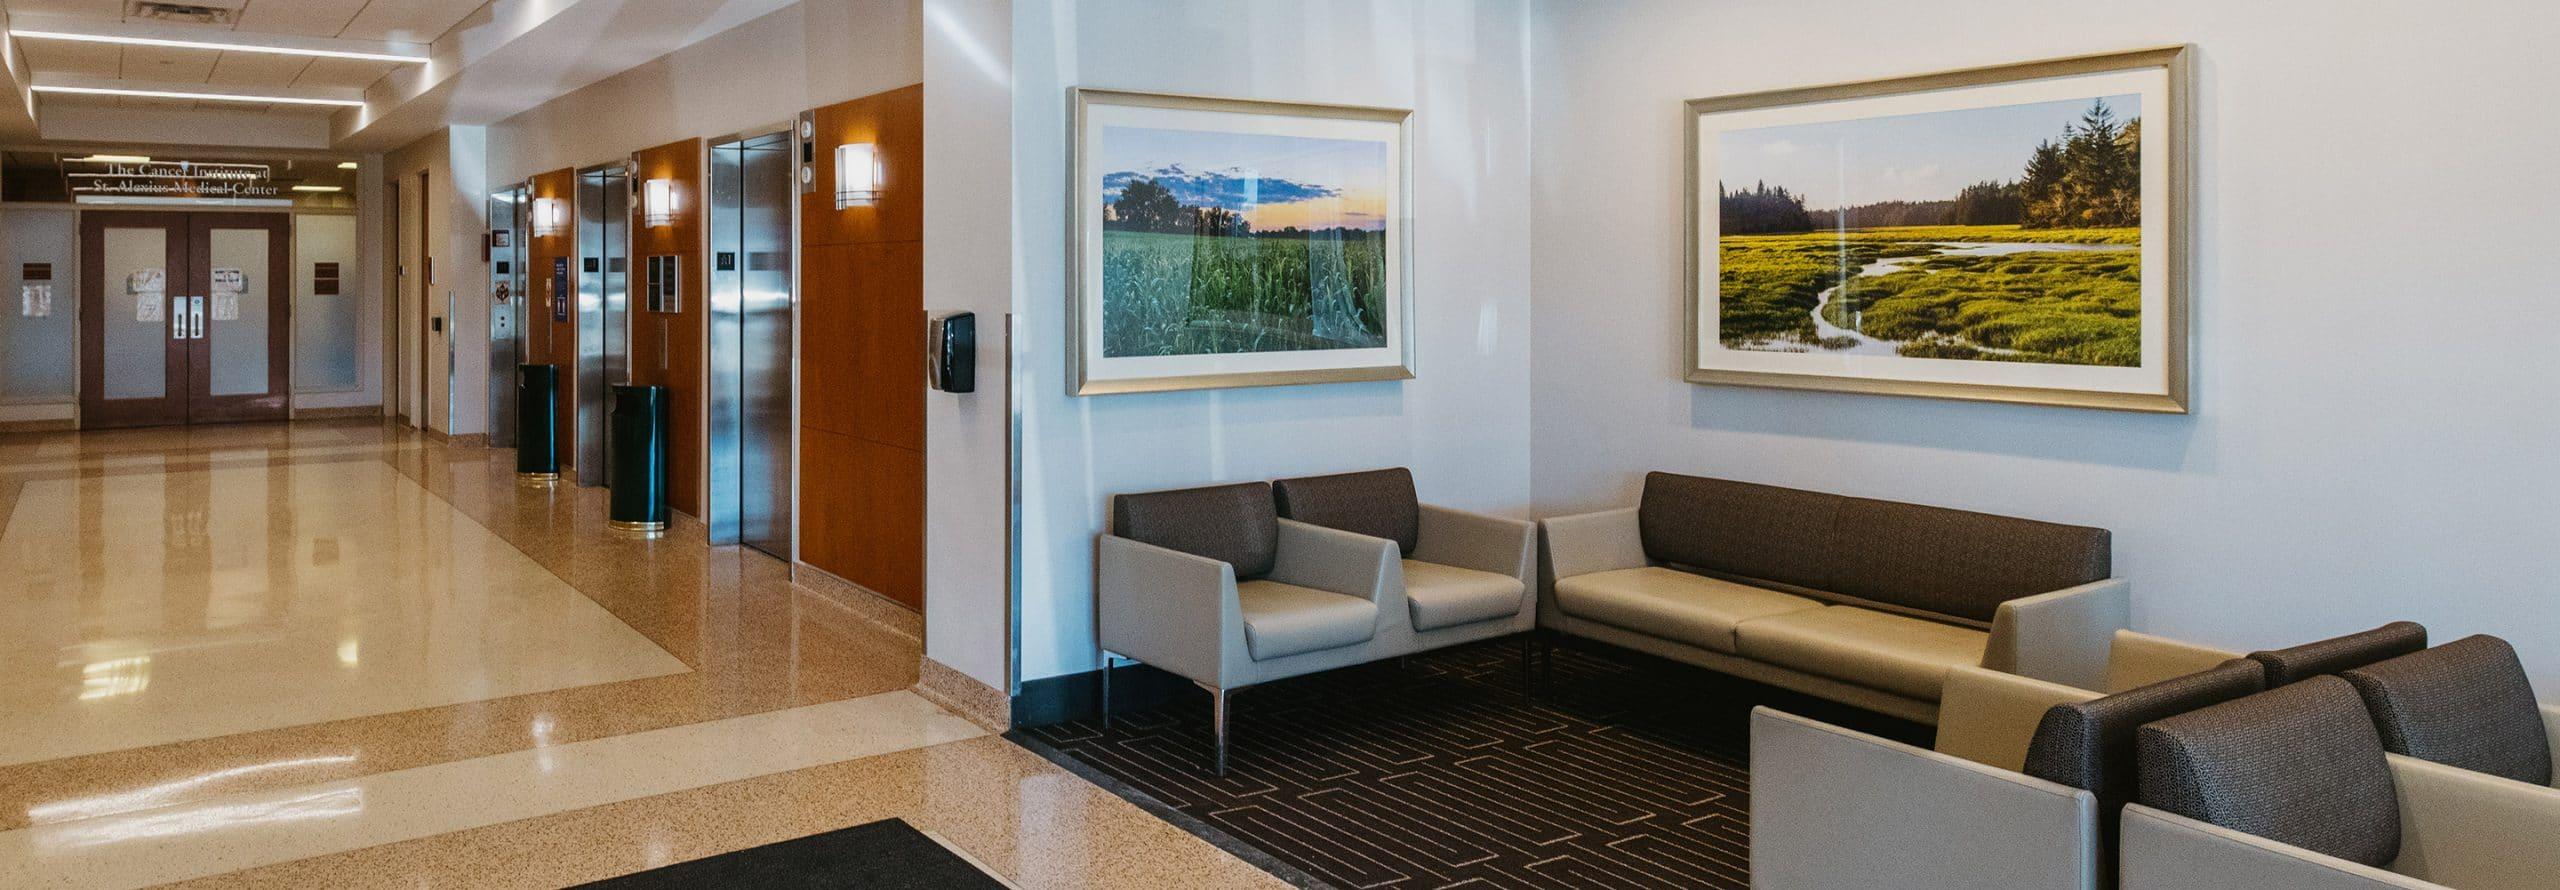 Diamond Headache Clinic Hoffman Estates Lobby